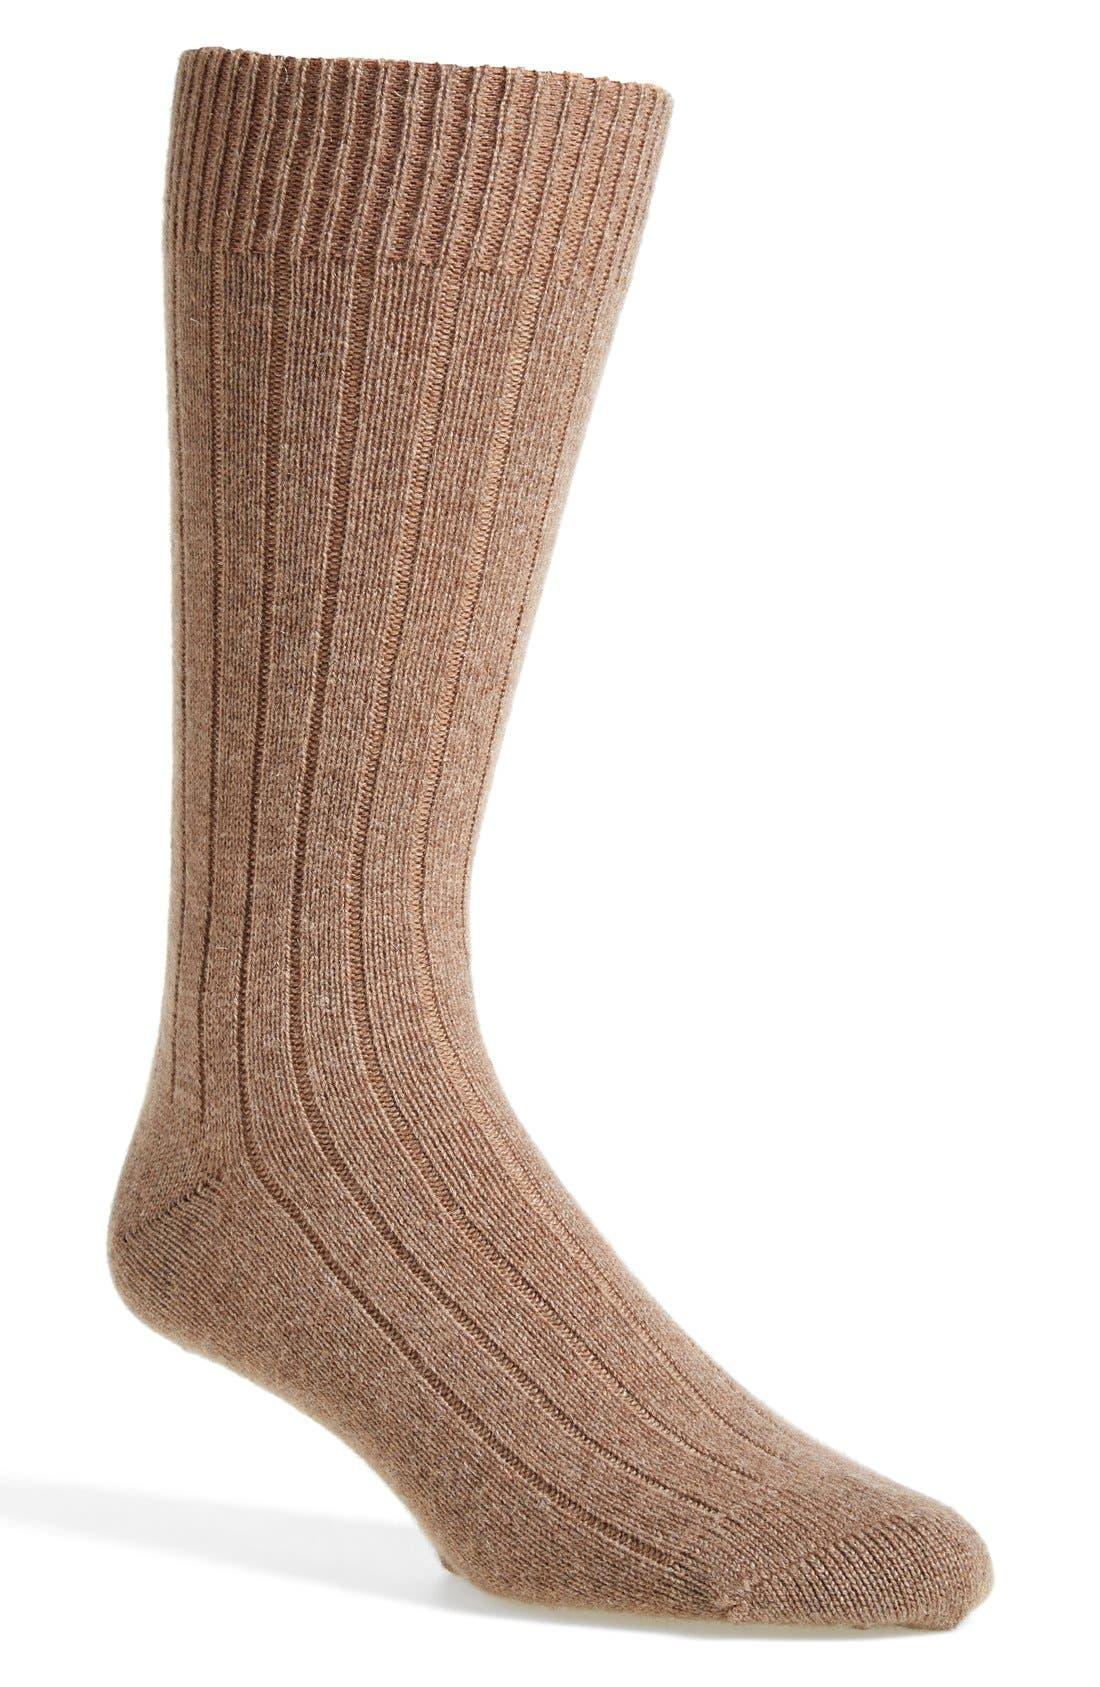 'Waddington' Cashmere Blend Mid Calf Socks,                             Main thumbnail 7, color,